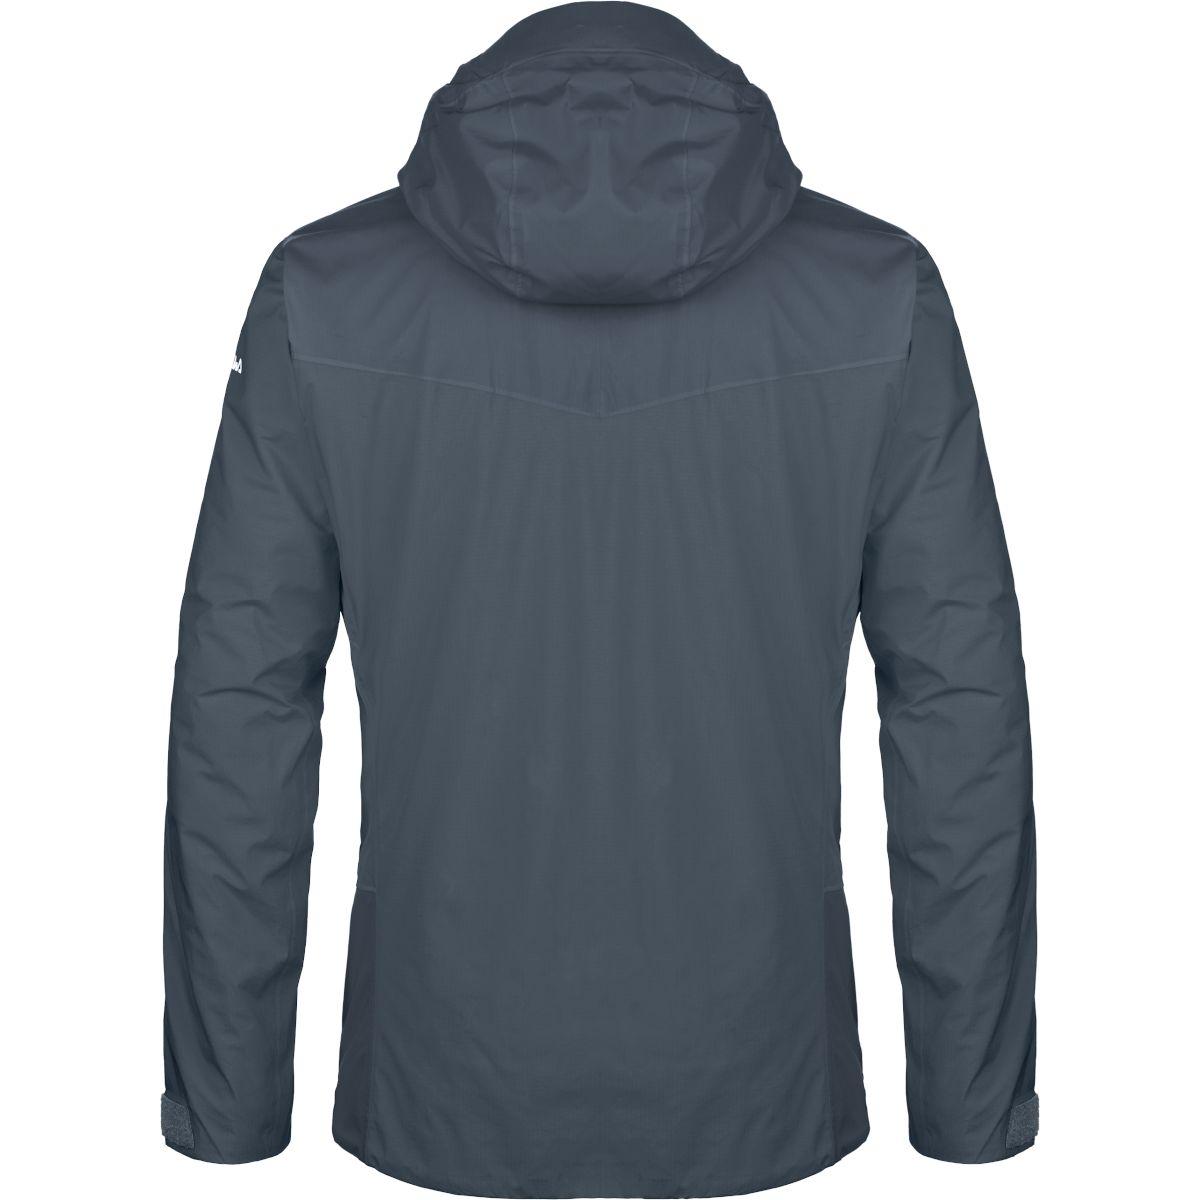 Куртка Salewa Puez 2 Powertex/Tirolwool 2L Mns Jacket